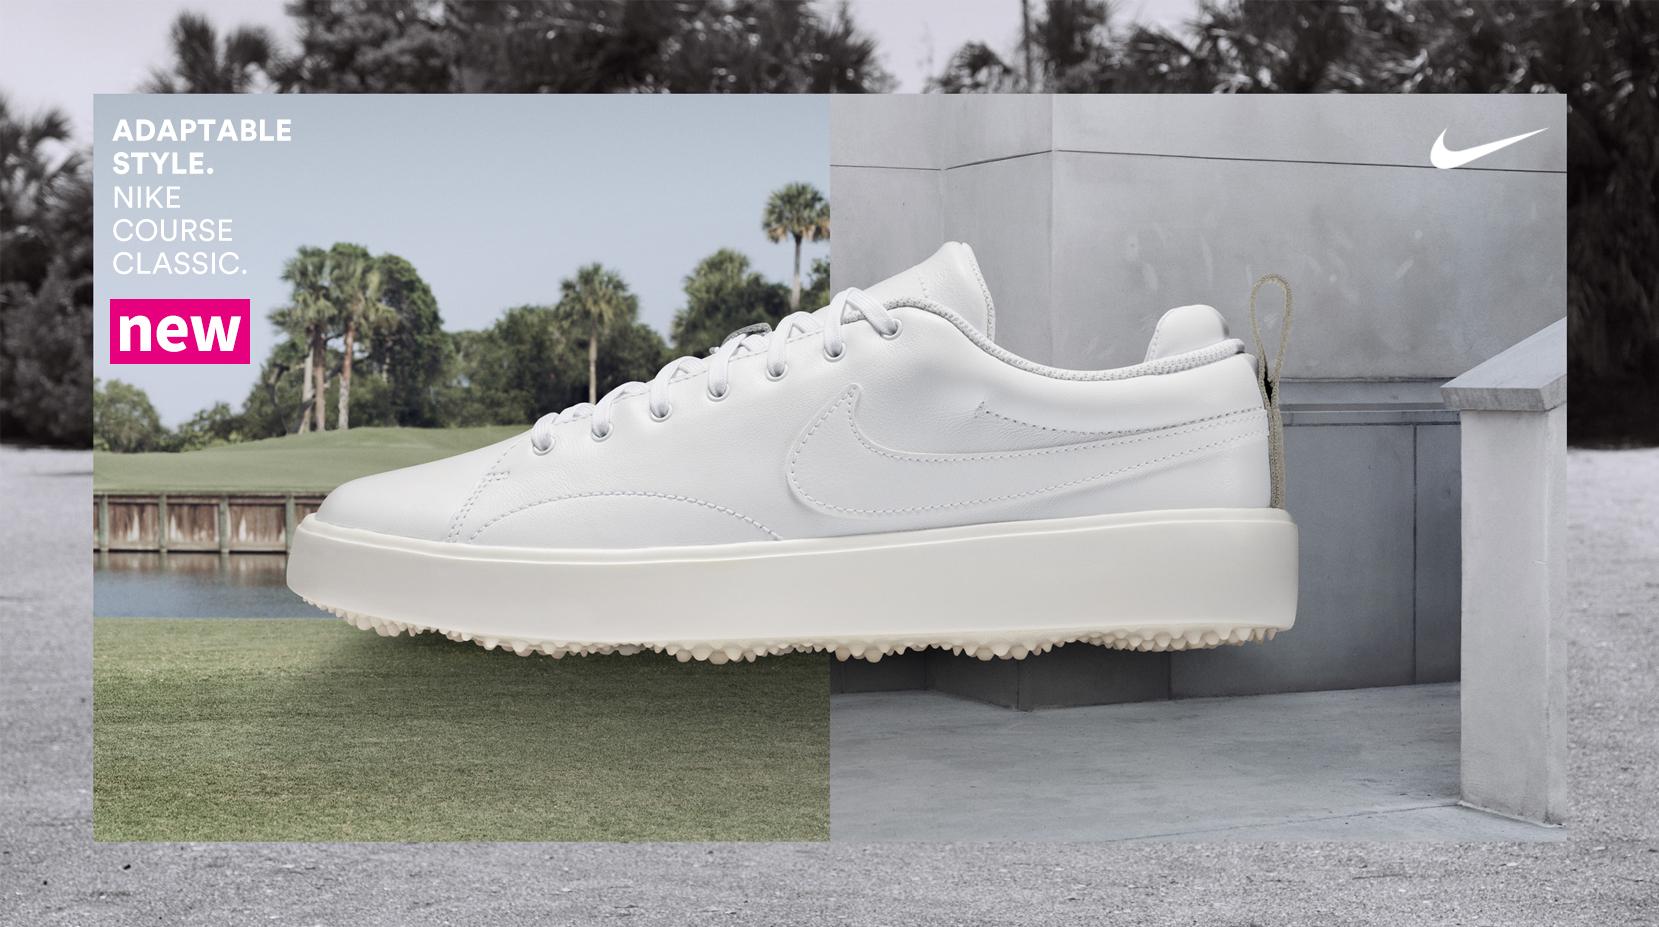 Nike course classic